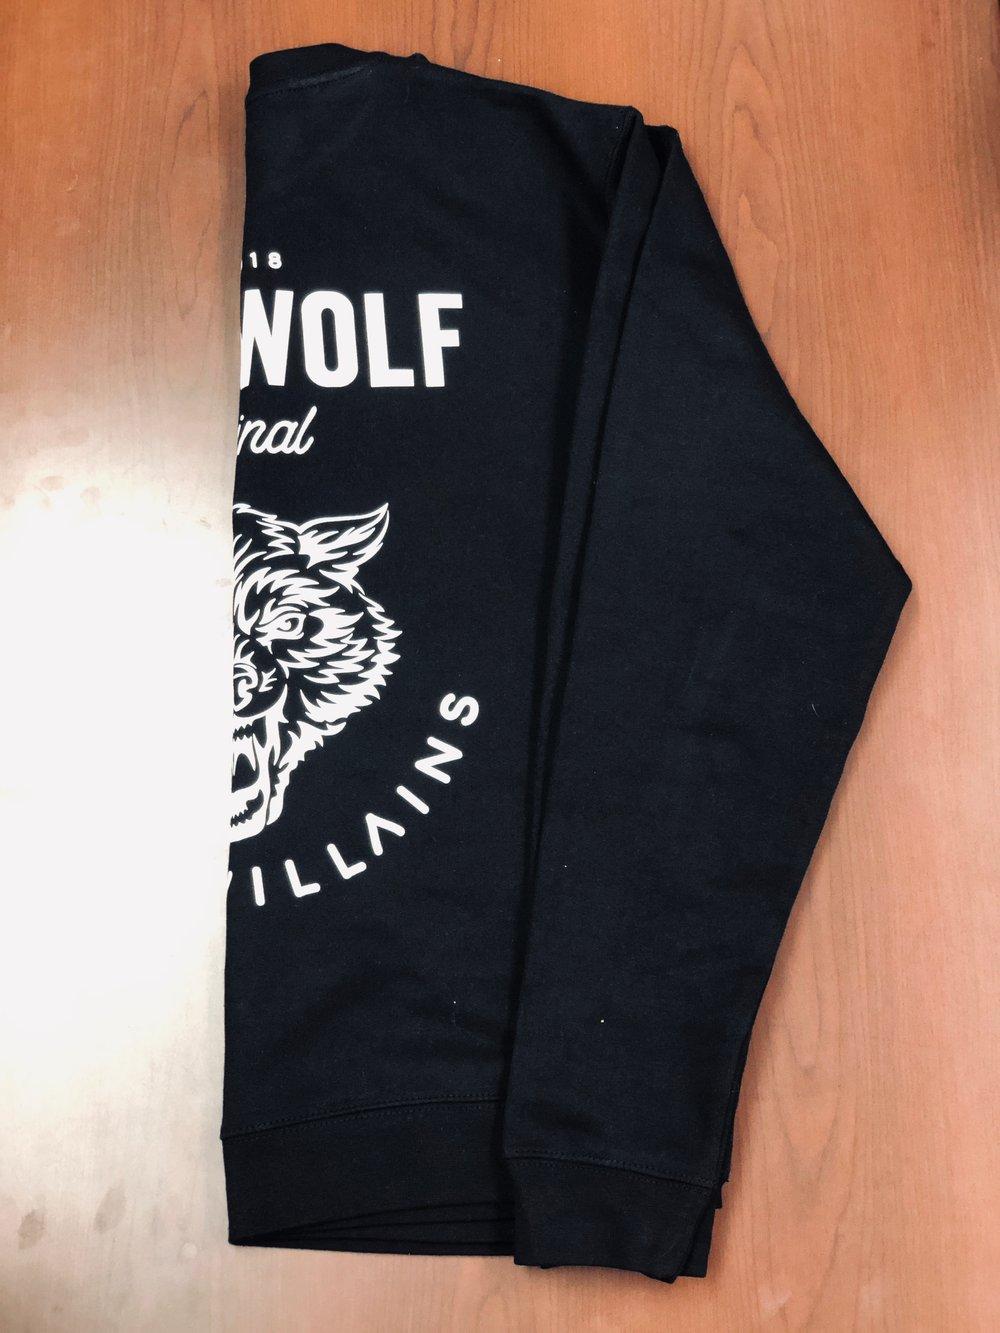 LONE WOLF black Crewneck sweatshirt